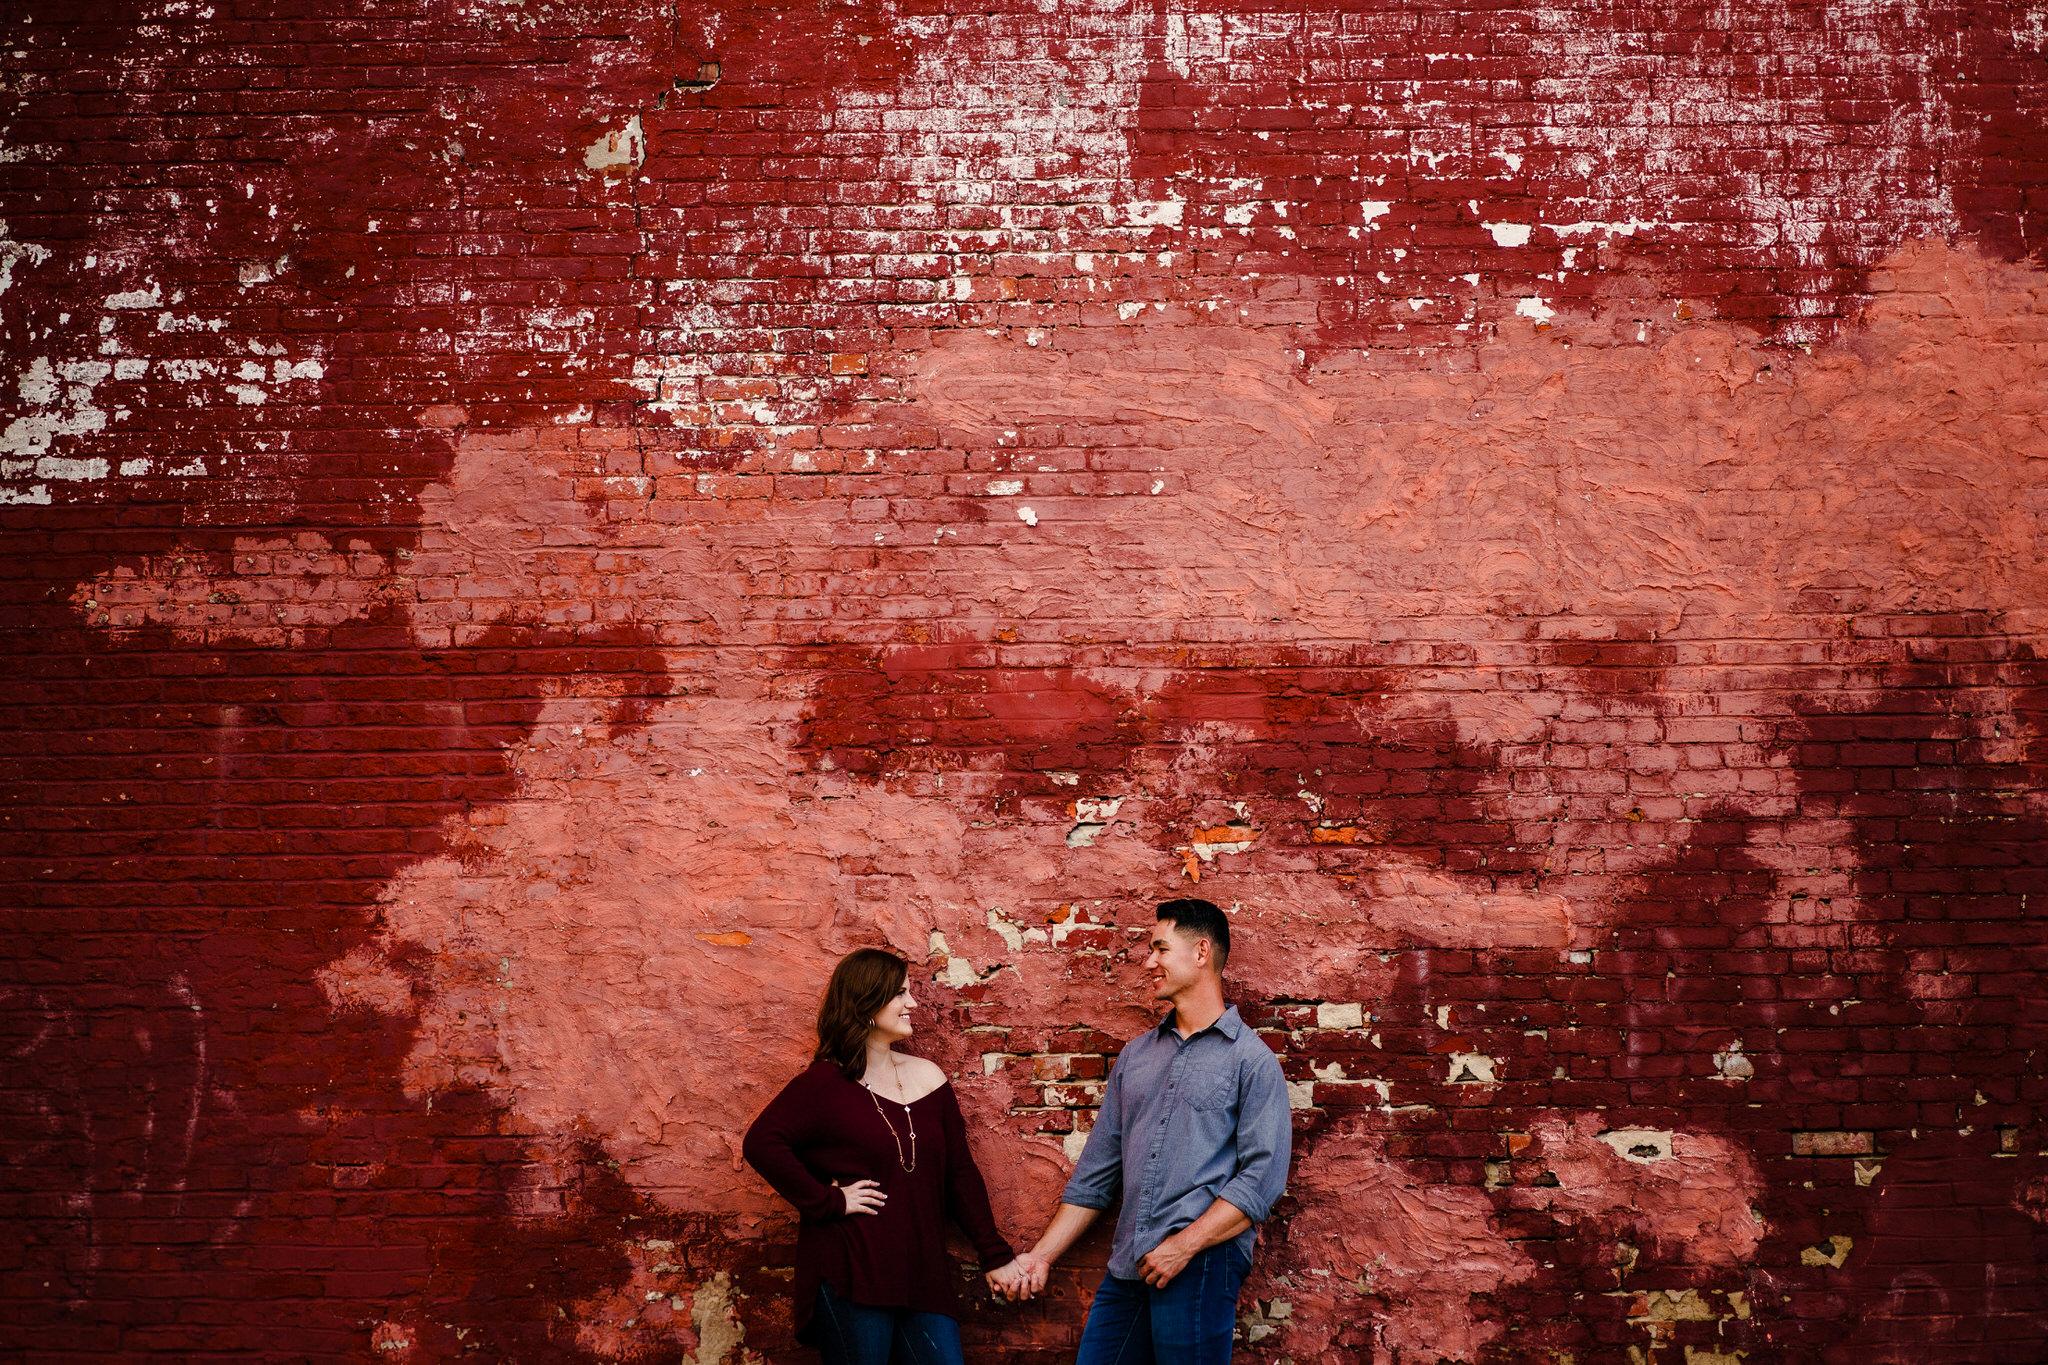 Shelby&Ye-New-Bern-Engagement-Photography-Chad-Winstead-002-1.jpg